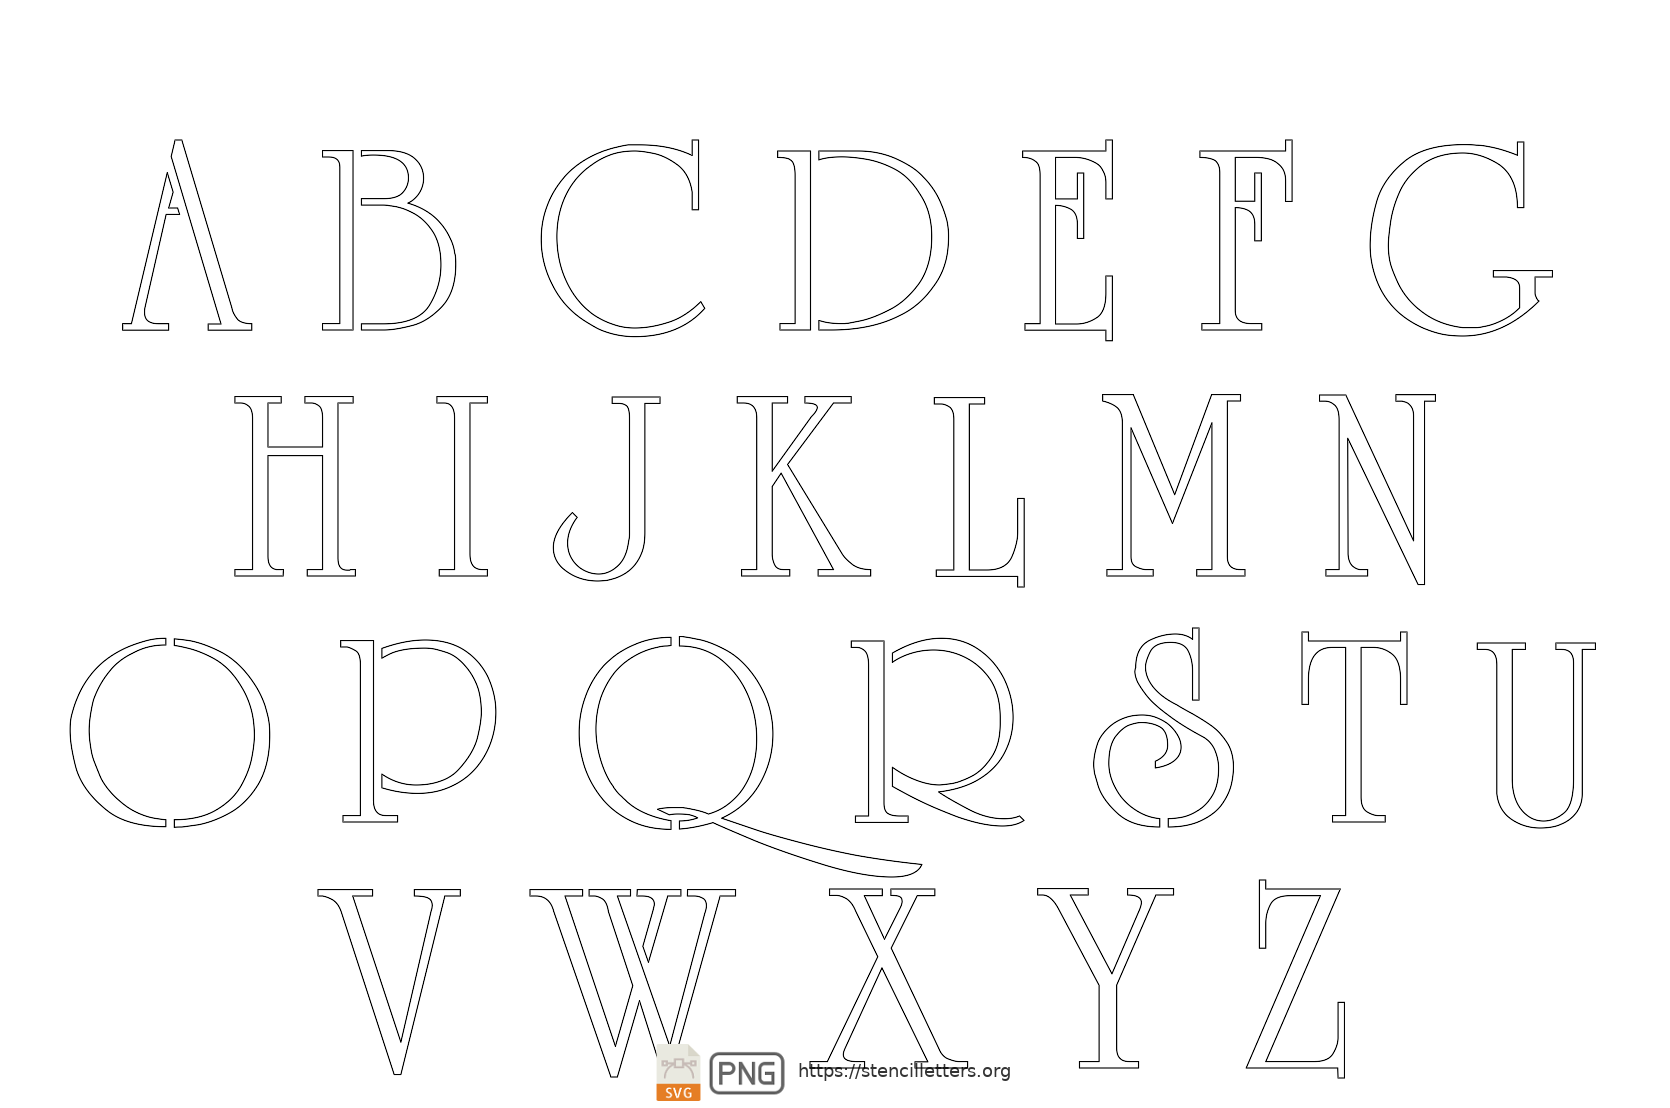 Grand & Stylish uppercase letter stencils